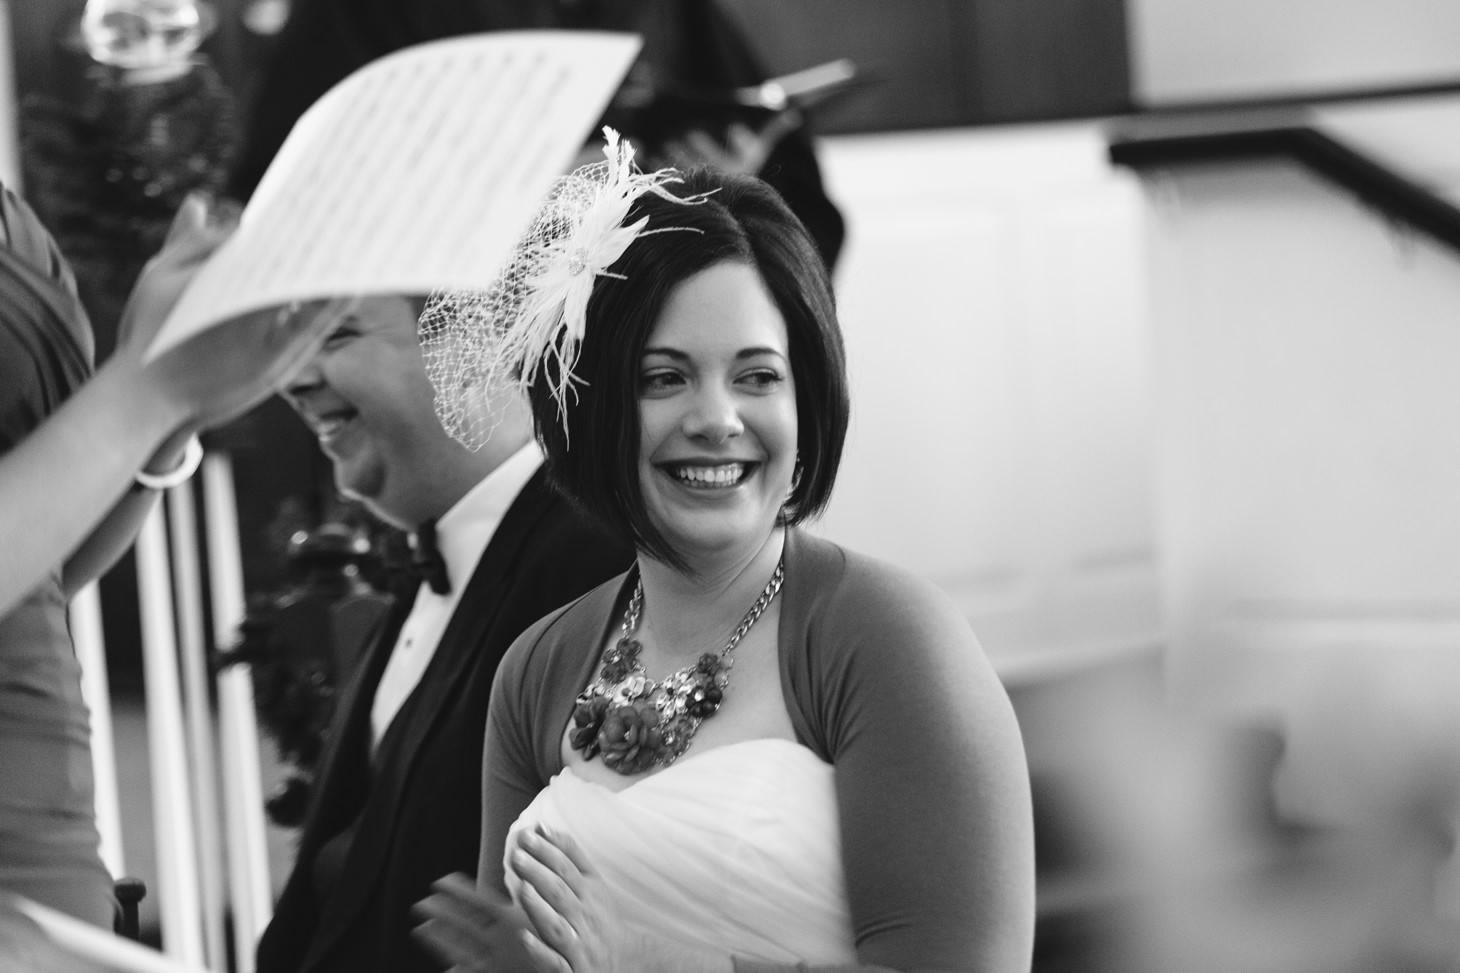 021-nyc-wedding-photographer-smitten-chickens-nj-montclair-art-museum.jpg